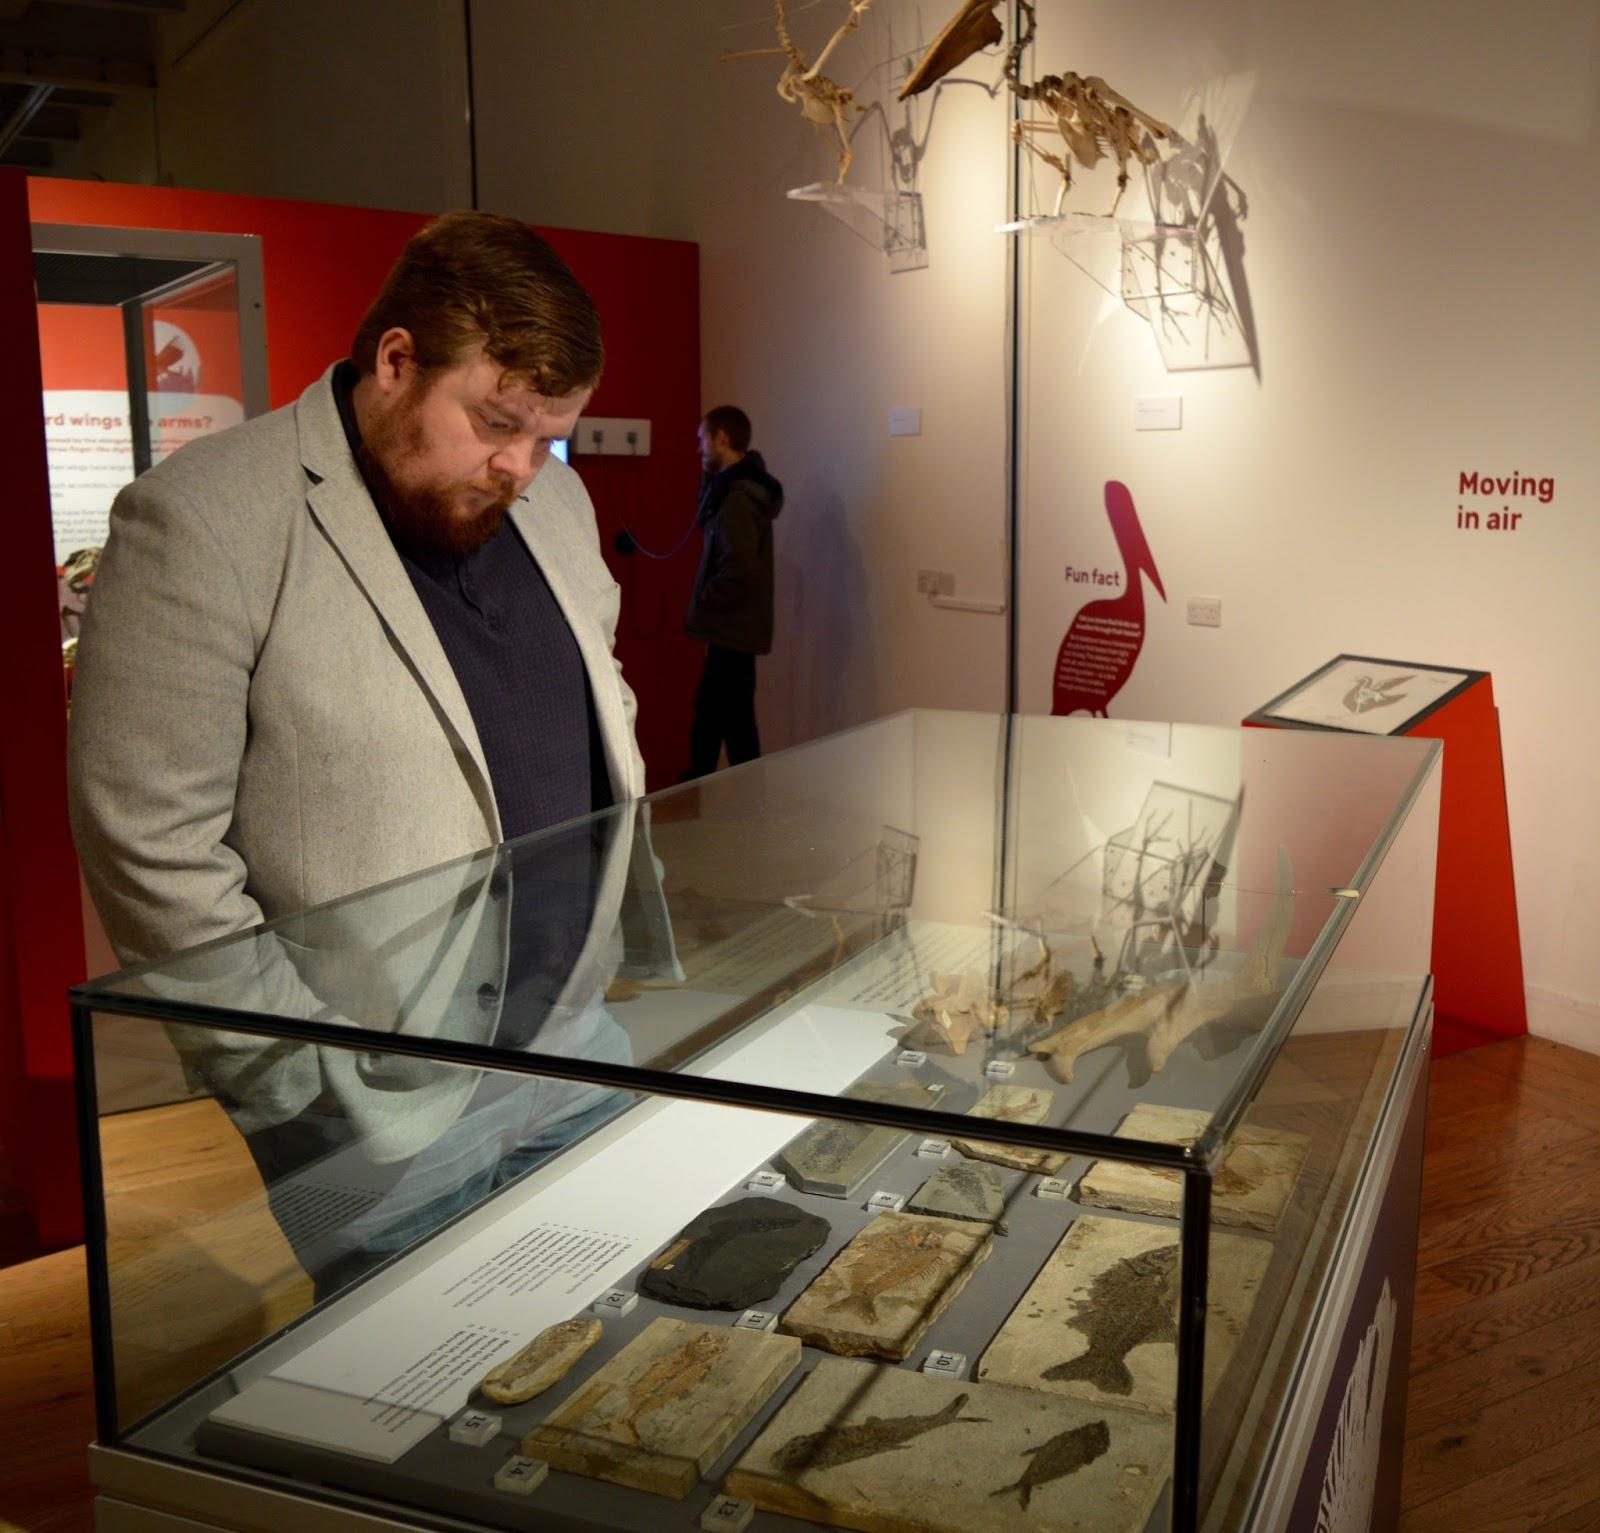 Bones Exhibition at Hancock Museum, Newcastle - fossils